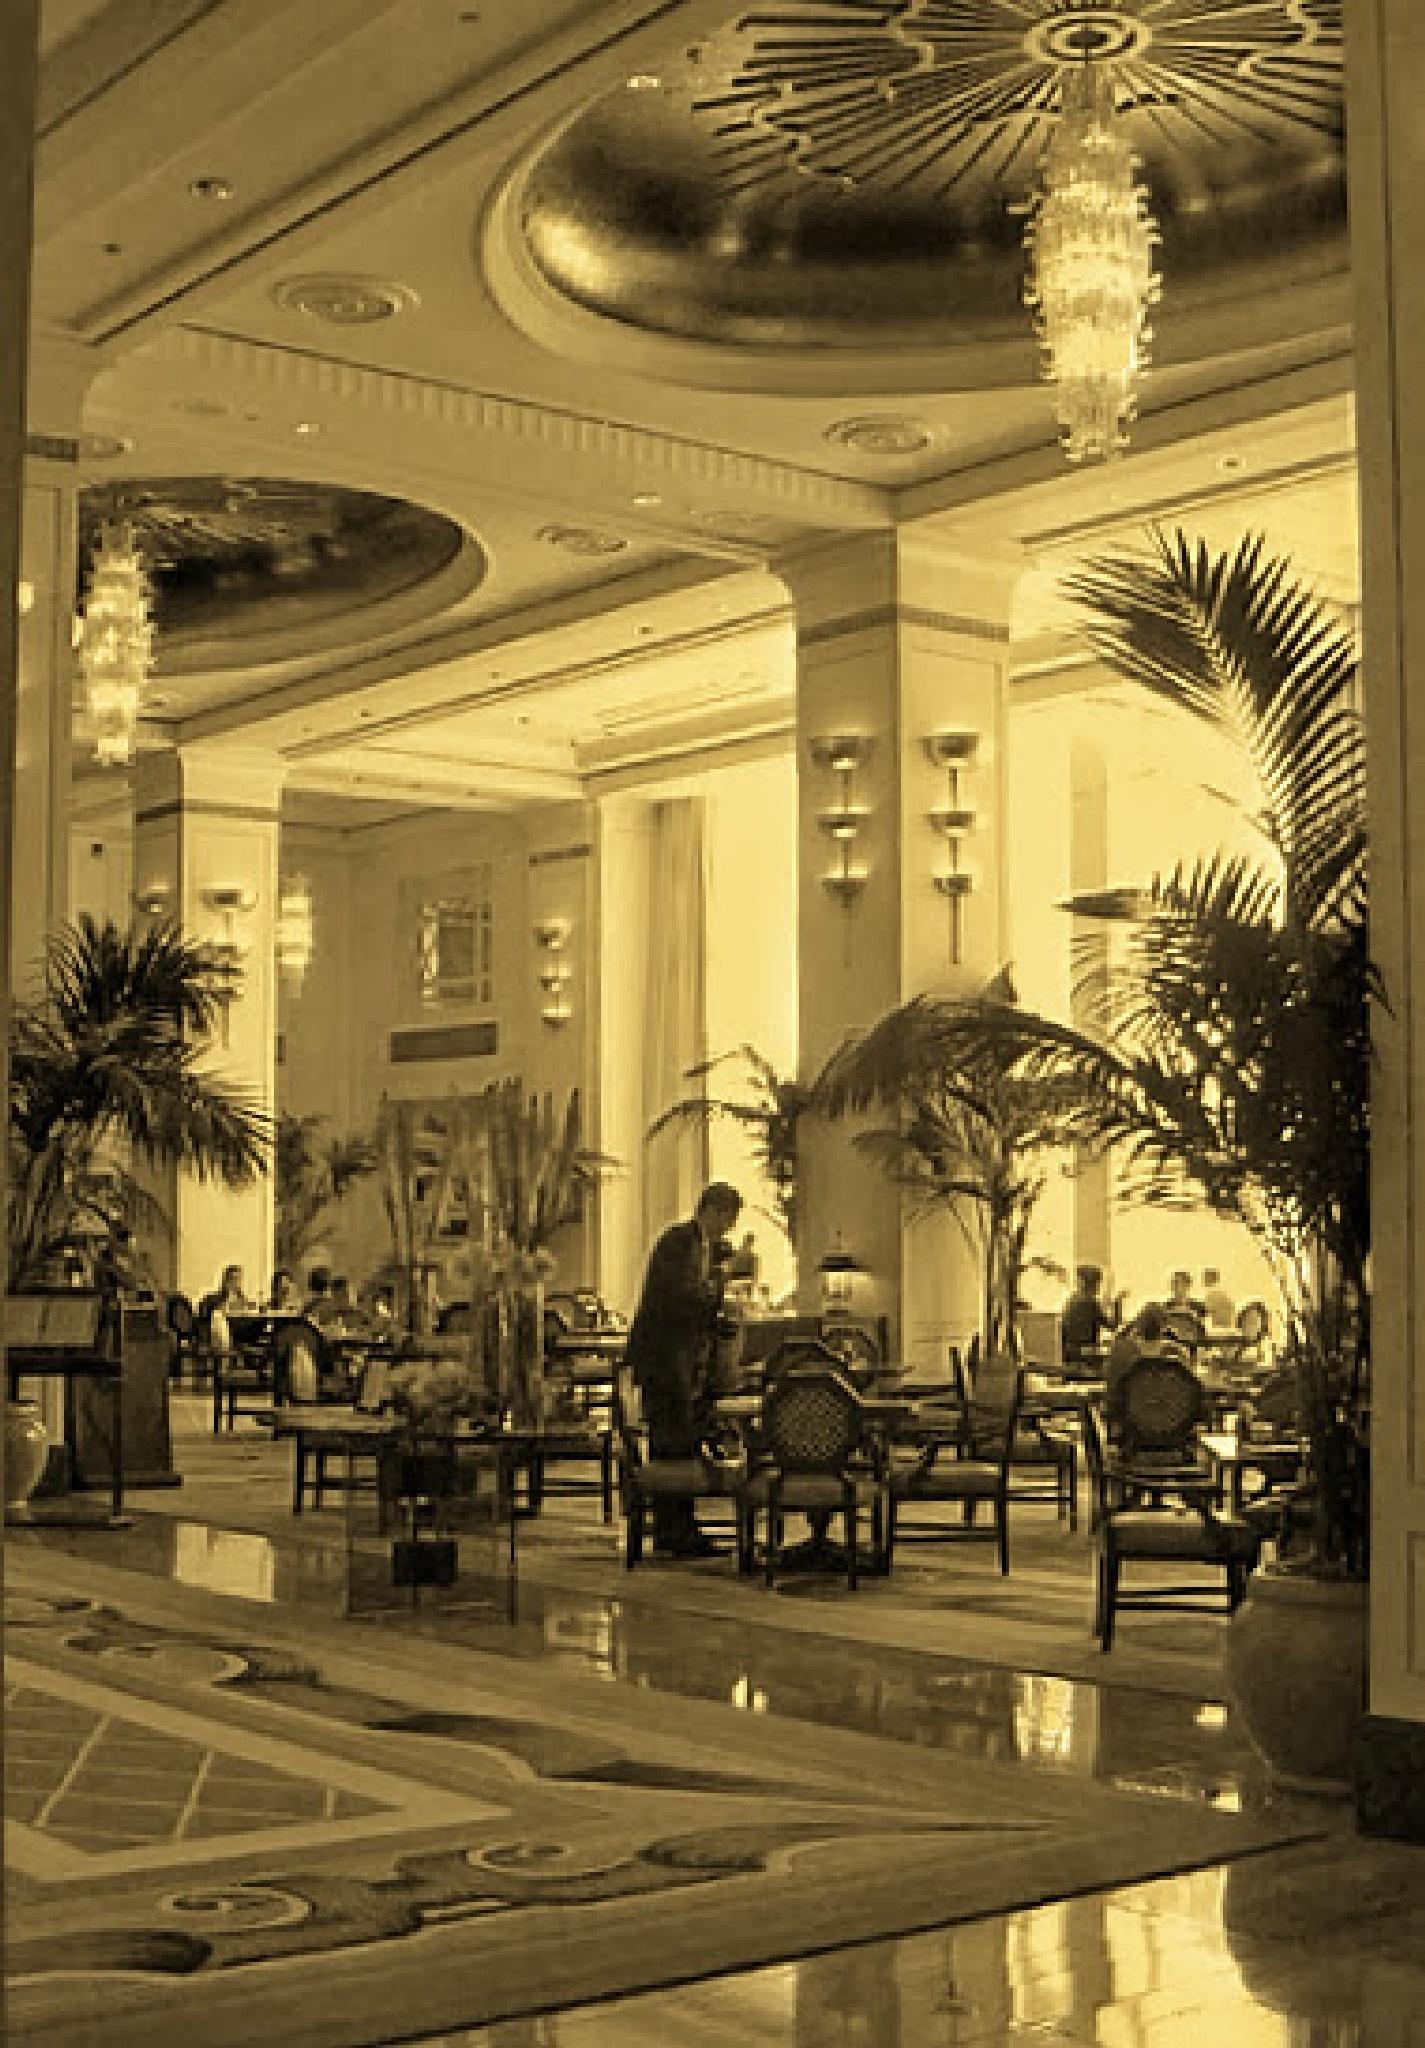 Peninsula Hotel Chicago IL by penguinhallmonitor